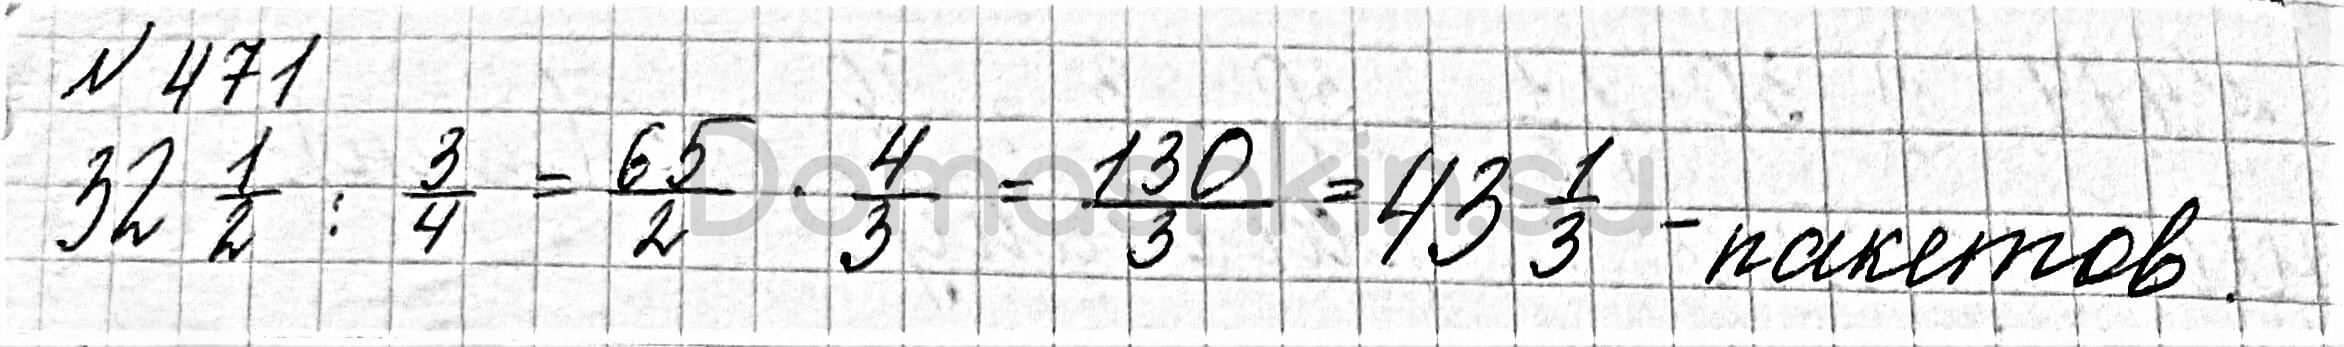 Математика 6 класс учебник Мерзляк номер 471 решение